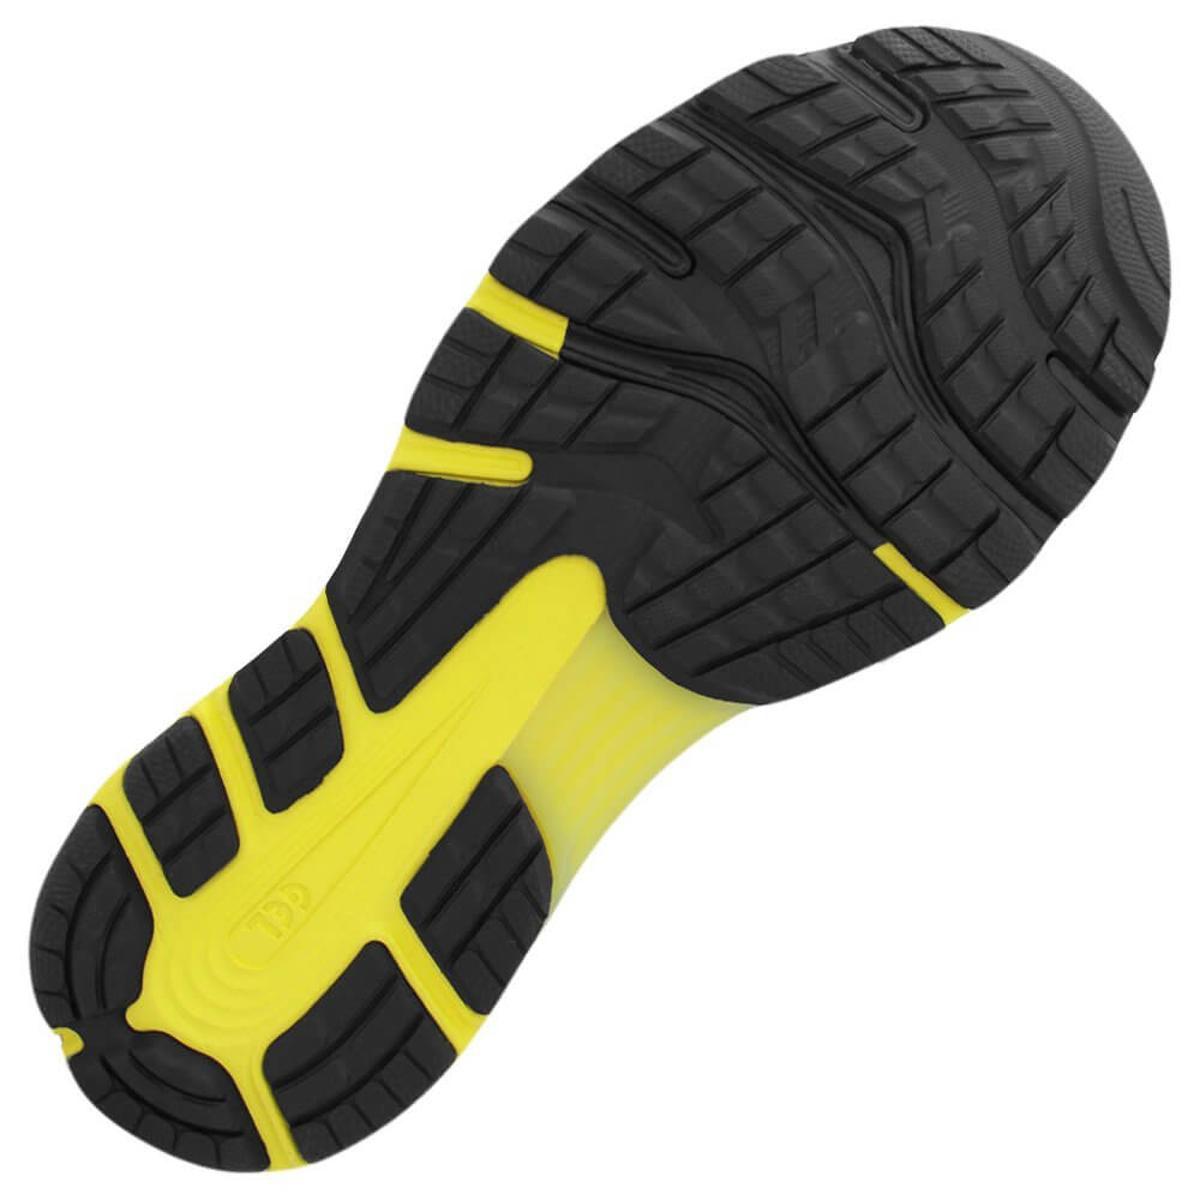 Tênis Asics Gel Nimbus 21 Masculino - Preto/Amarelo